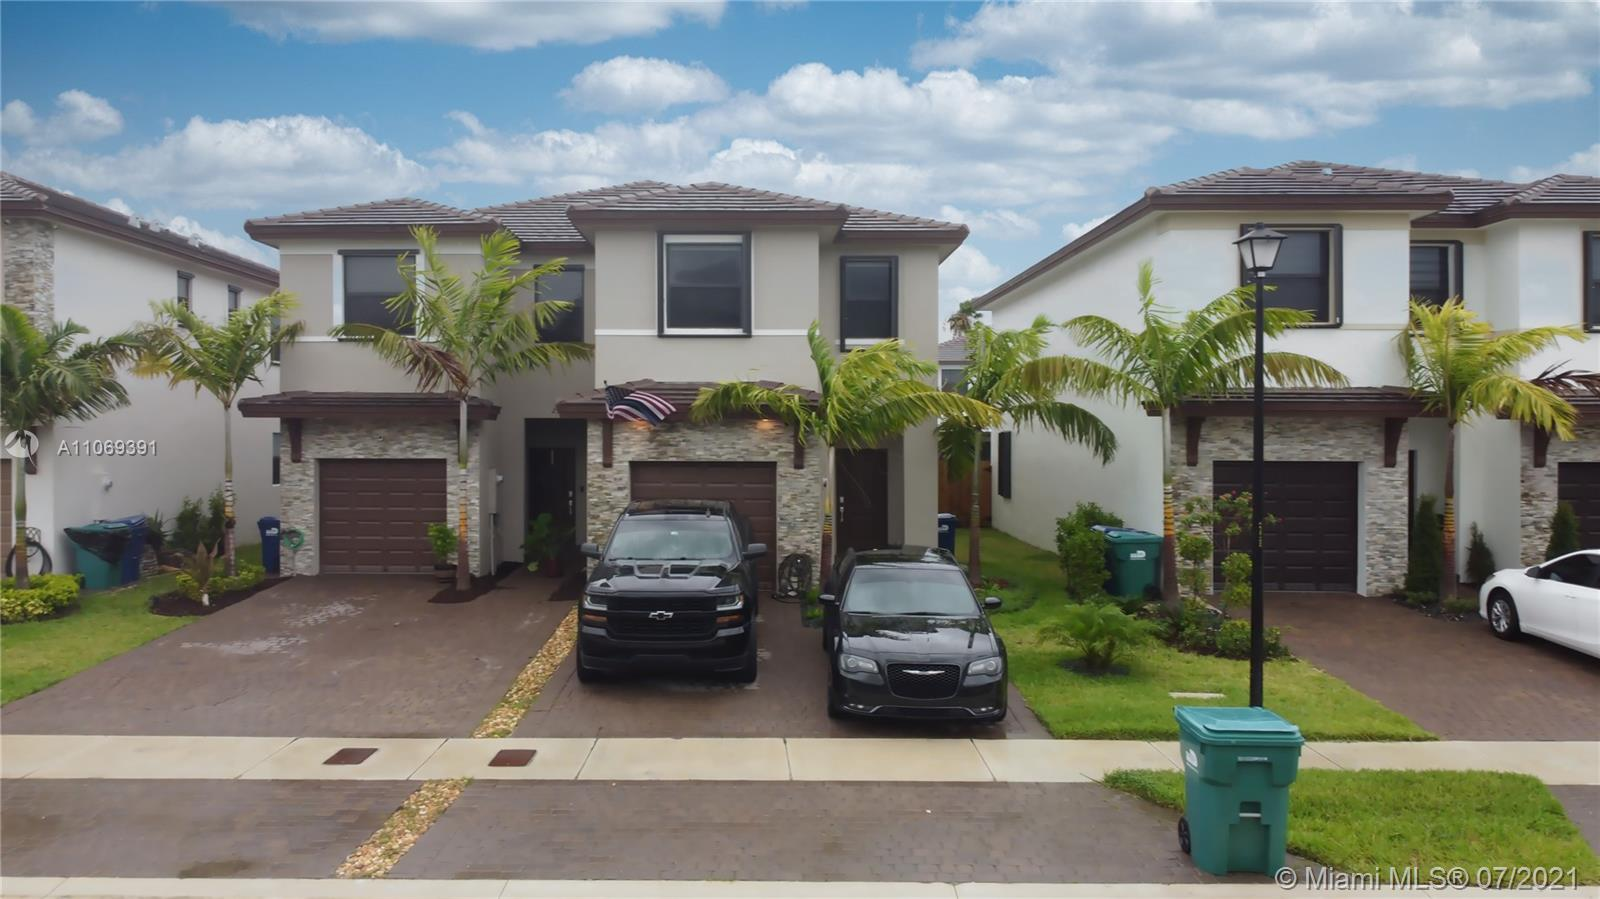 25134 Sw 108th Ct Property Photo 1